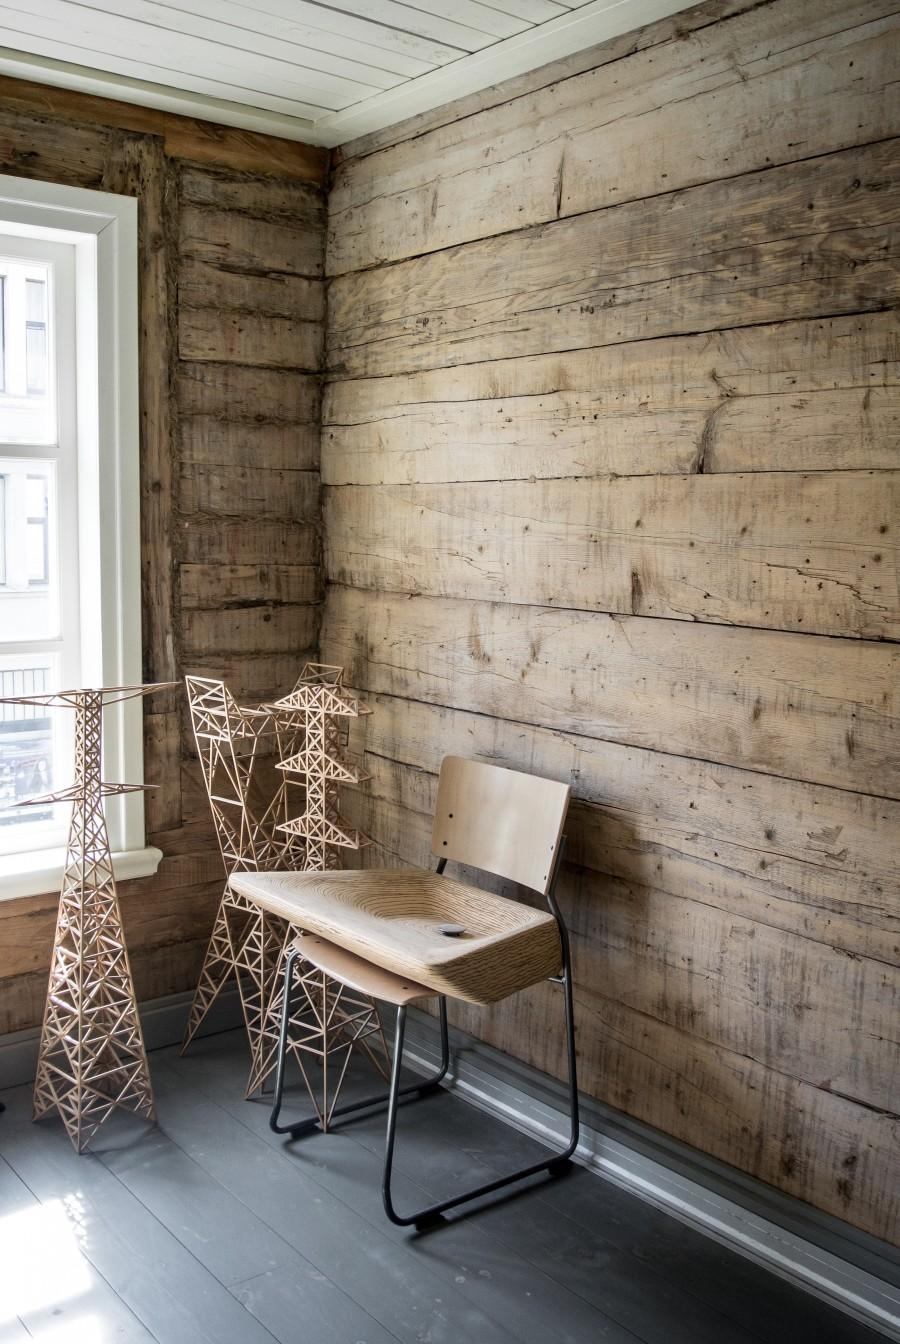 IKEA-ARTSCHOOL-109-e1499173748130.jpg